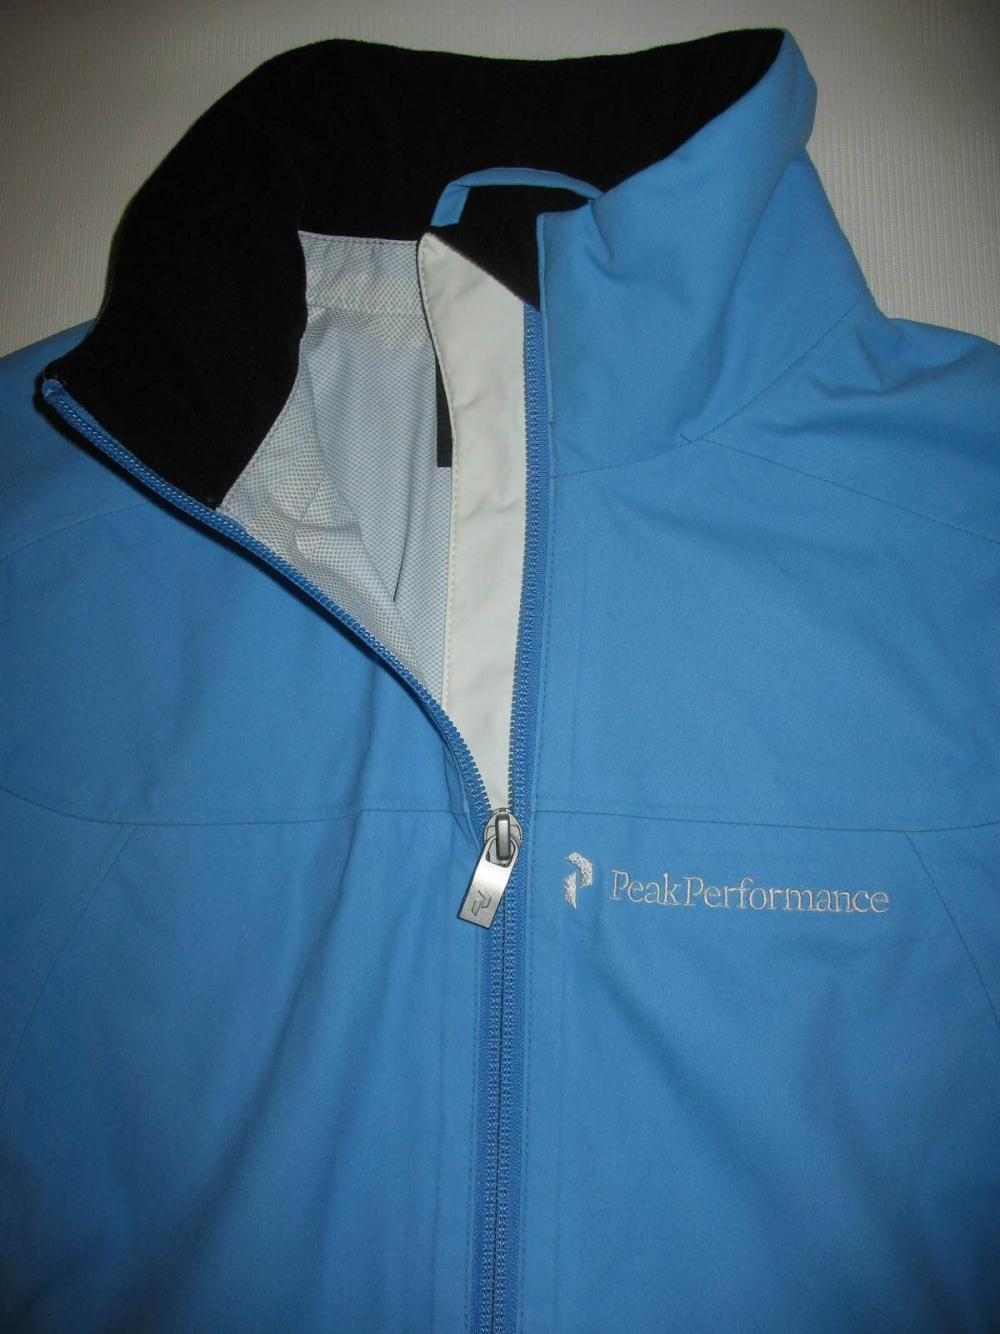 Куртка PEAK PERFOMANCE hybrid jacket lady (размер М) - 3